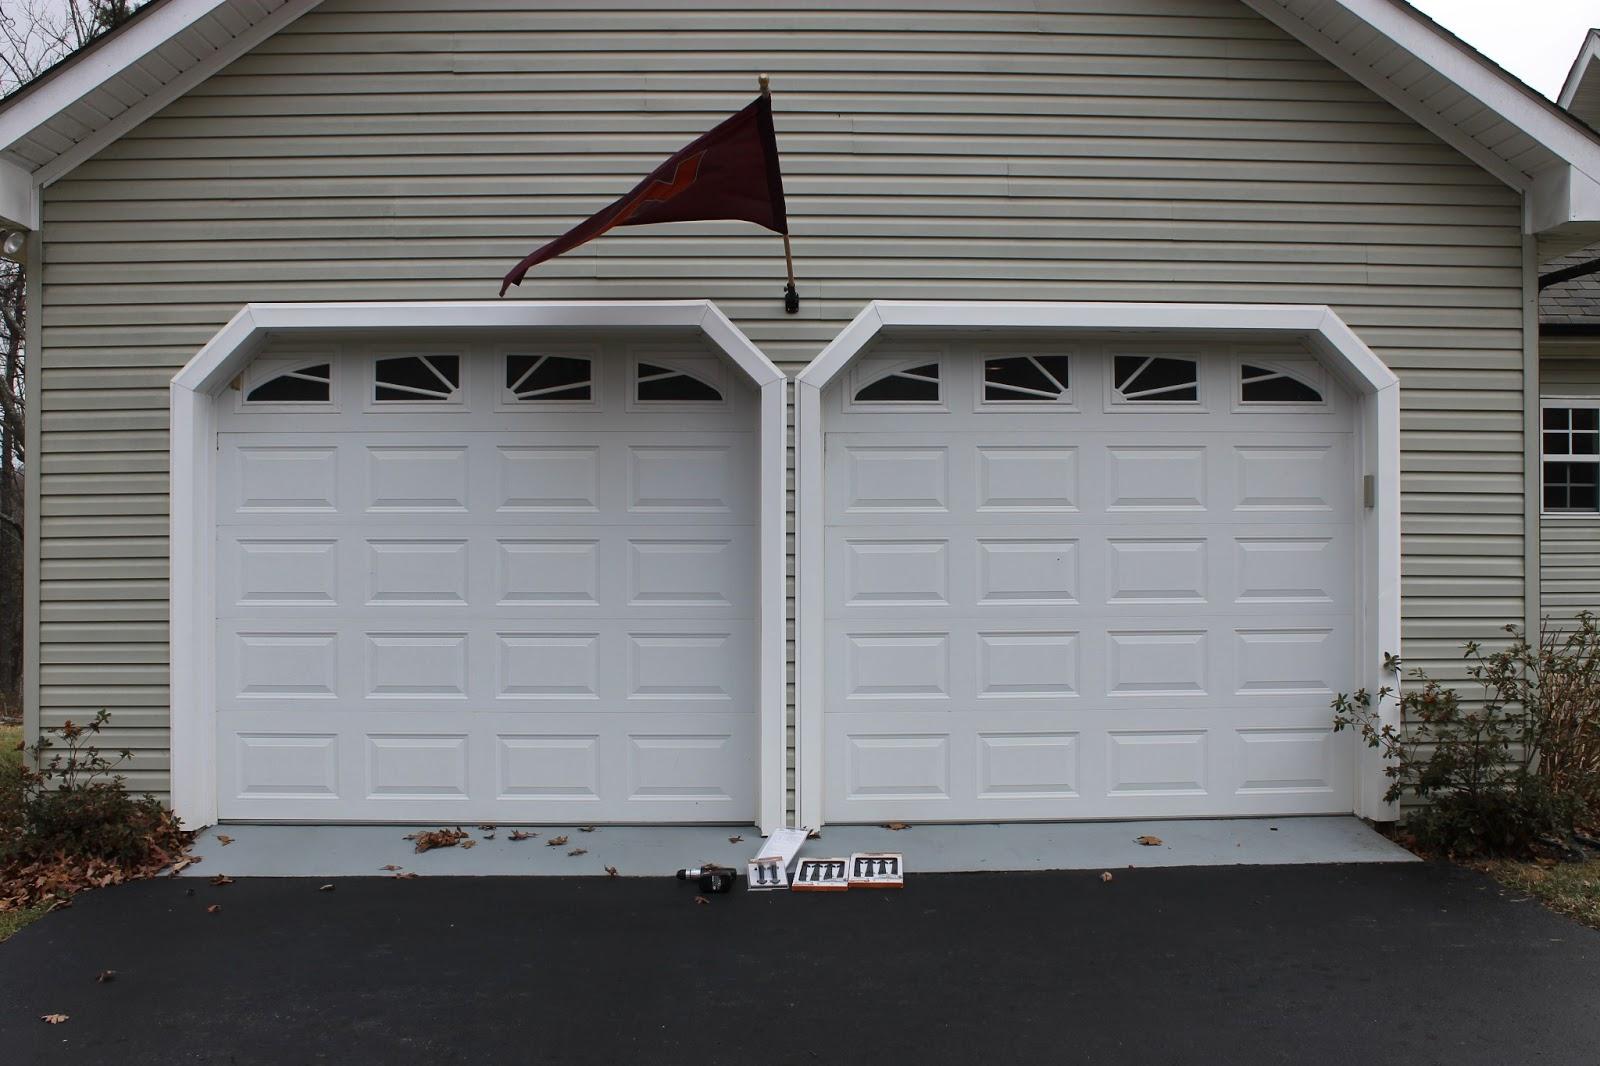 Home depot garage paint home painting ideas for 18 x 8 garage door screen